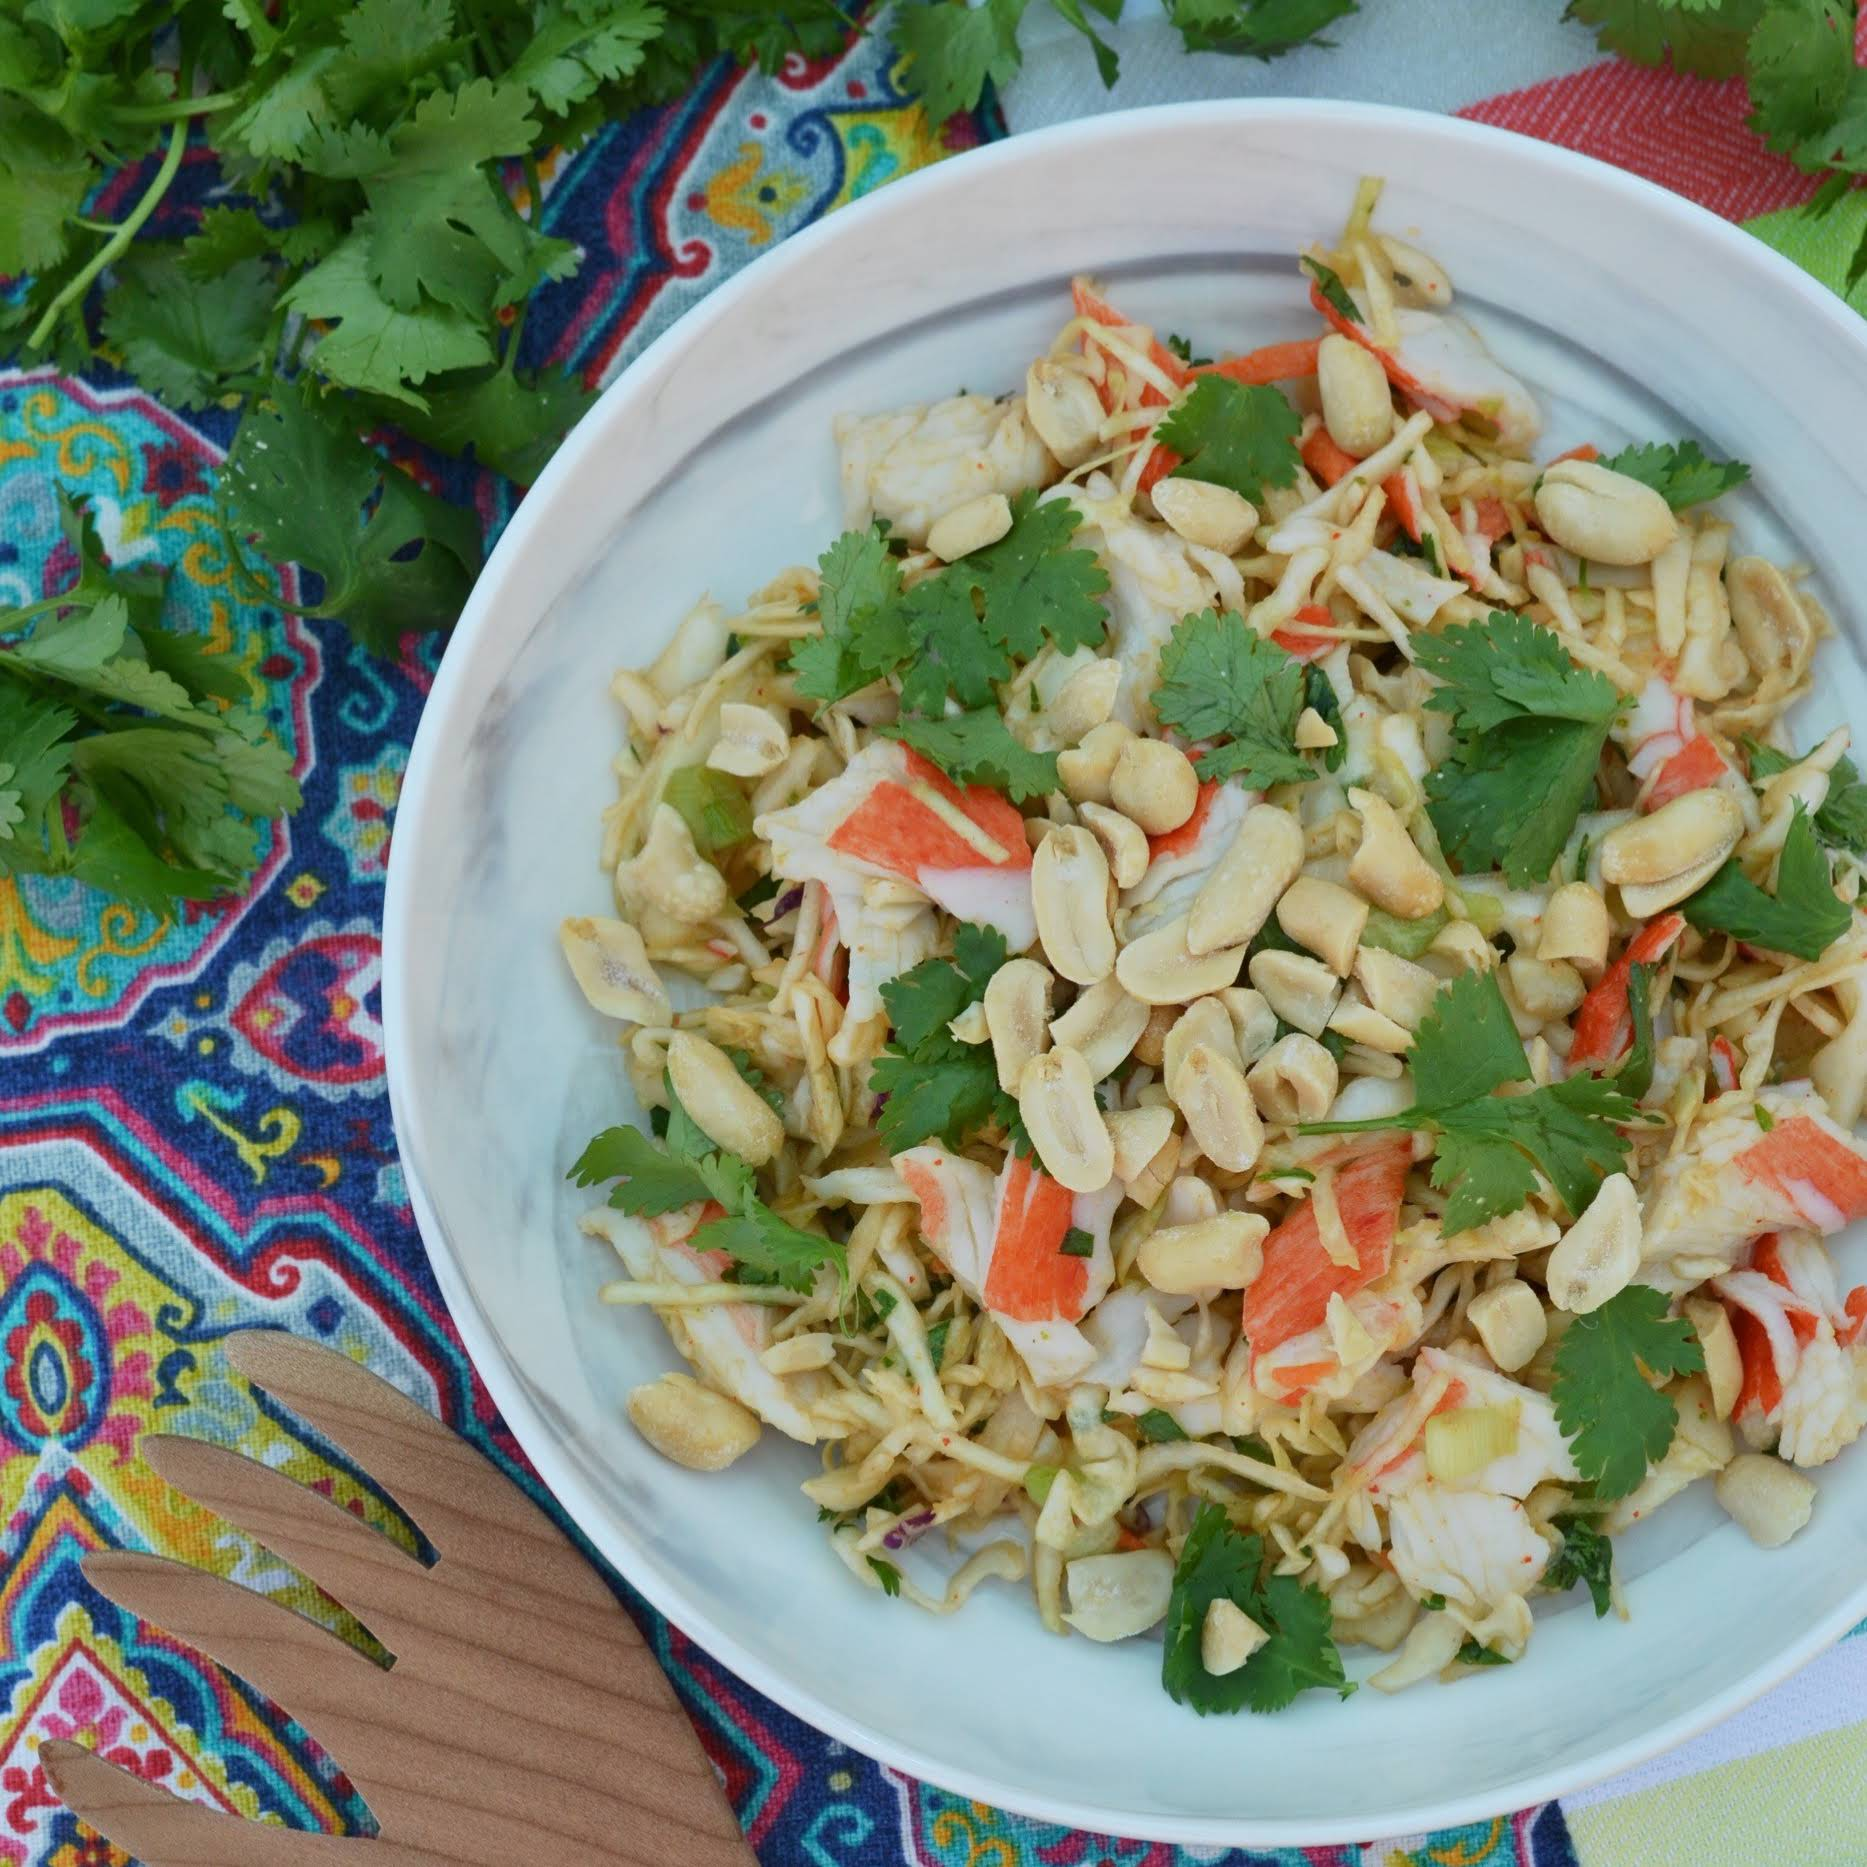 10 Best Imitation Crab Meat Healthy Recipes Yummly